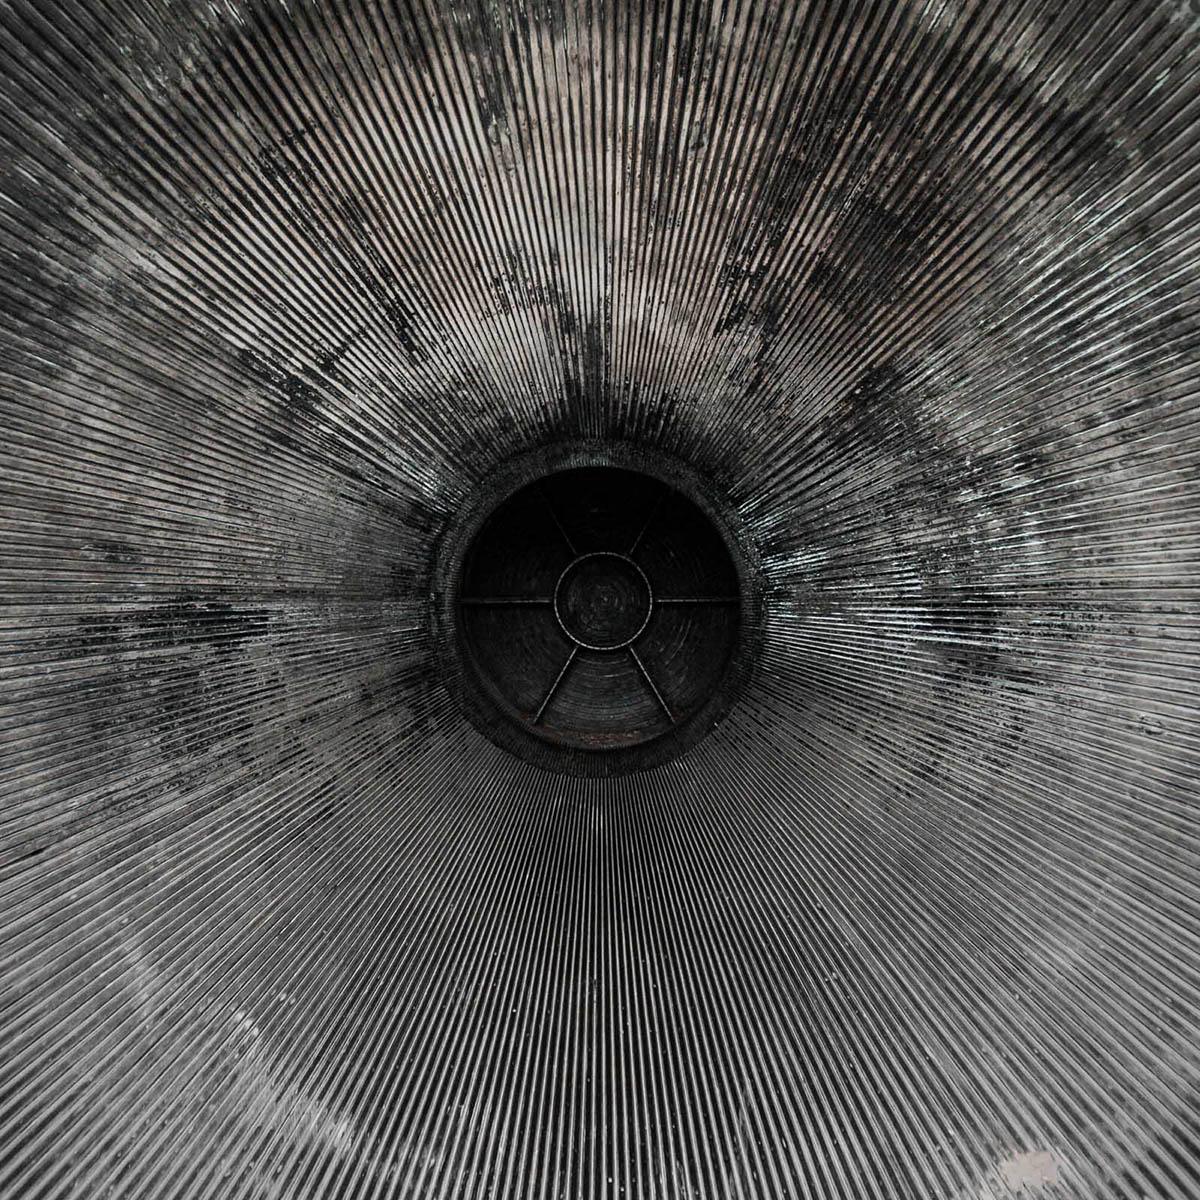 Closeup of a rocket engine by Jordan Reeder